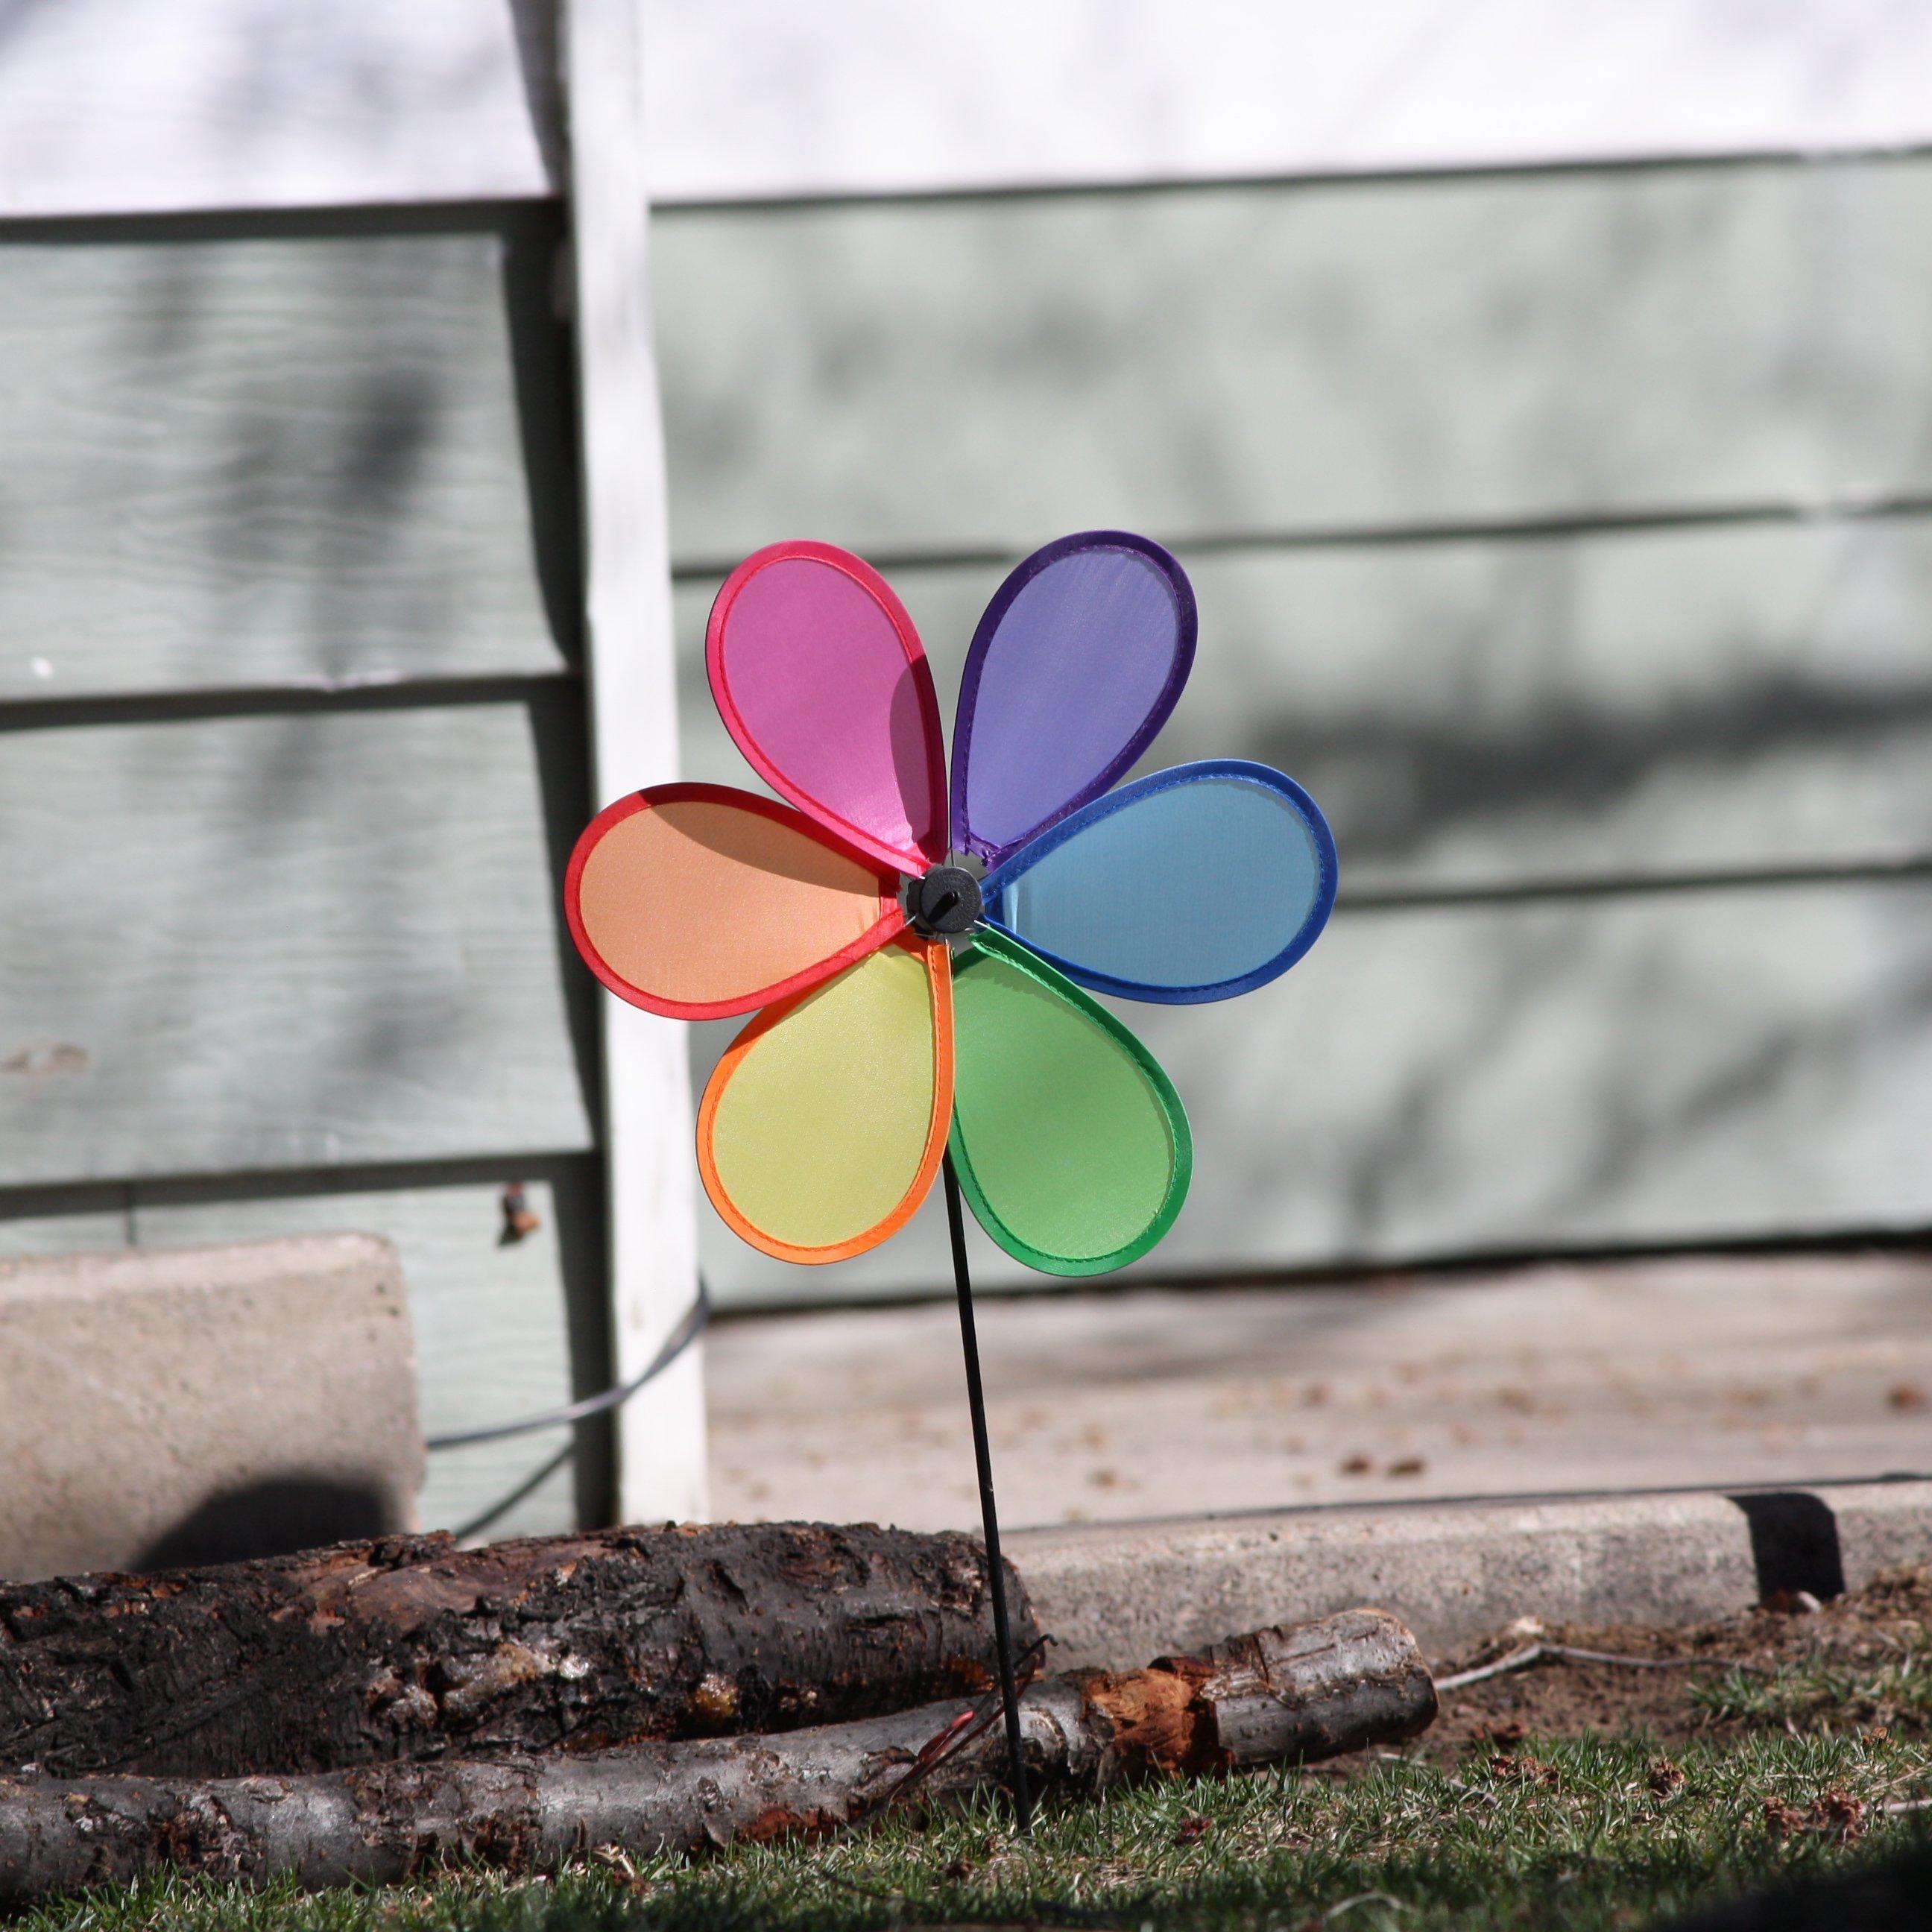 Colorful Pinwheel Yard Decoration Photos Public Domain